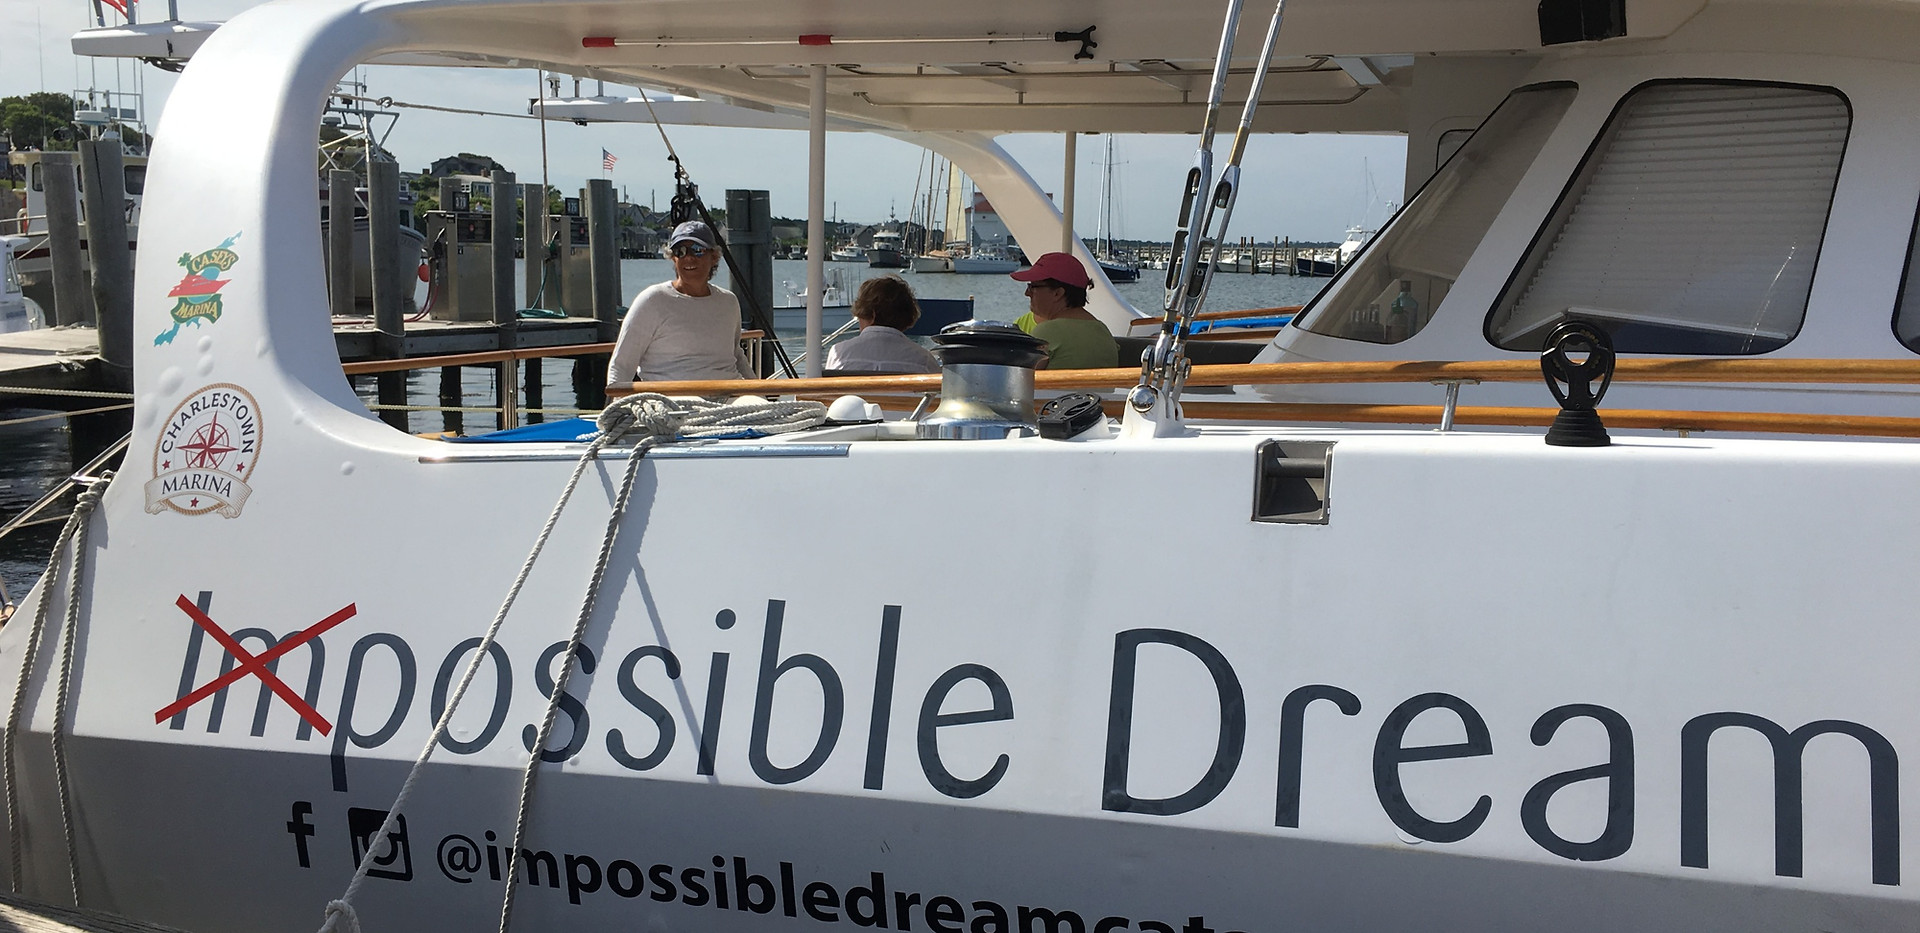 All Aboard the Impossible Dream Catamaran